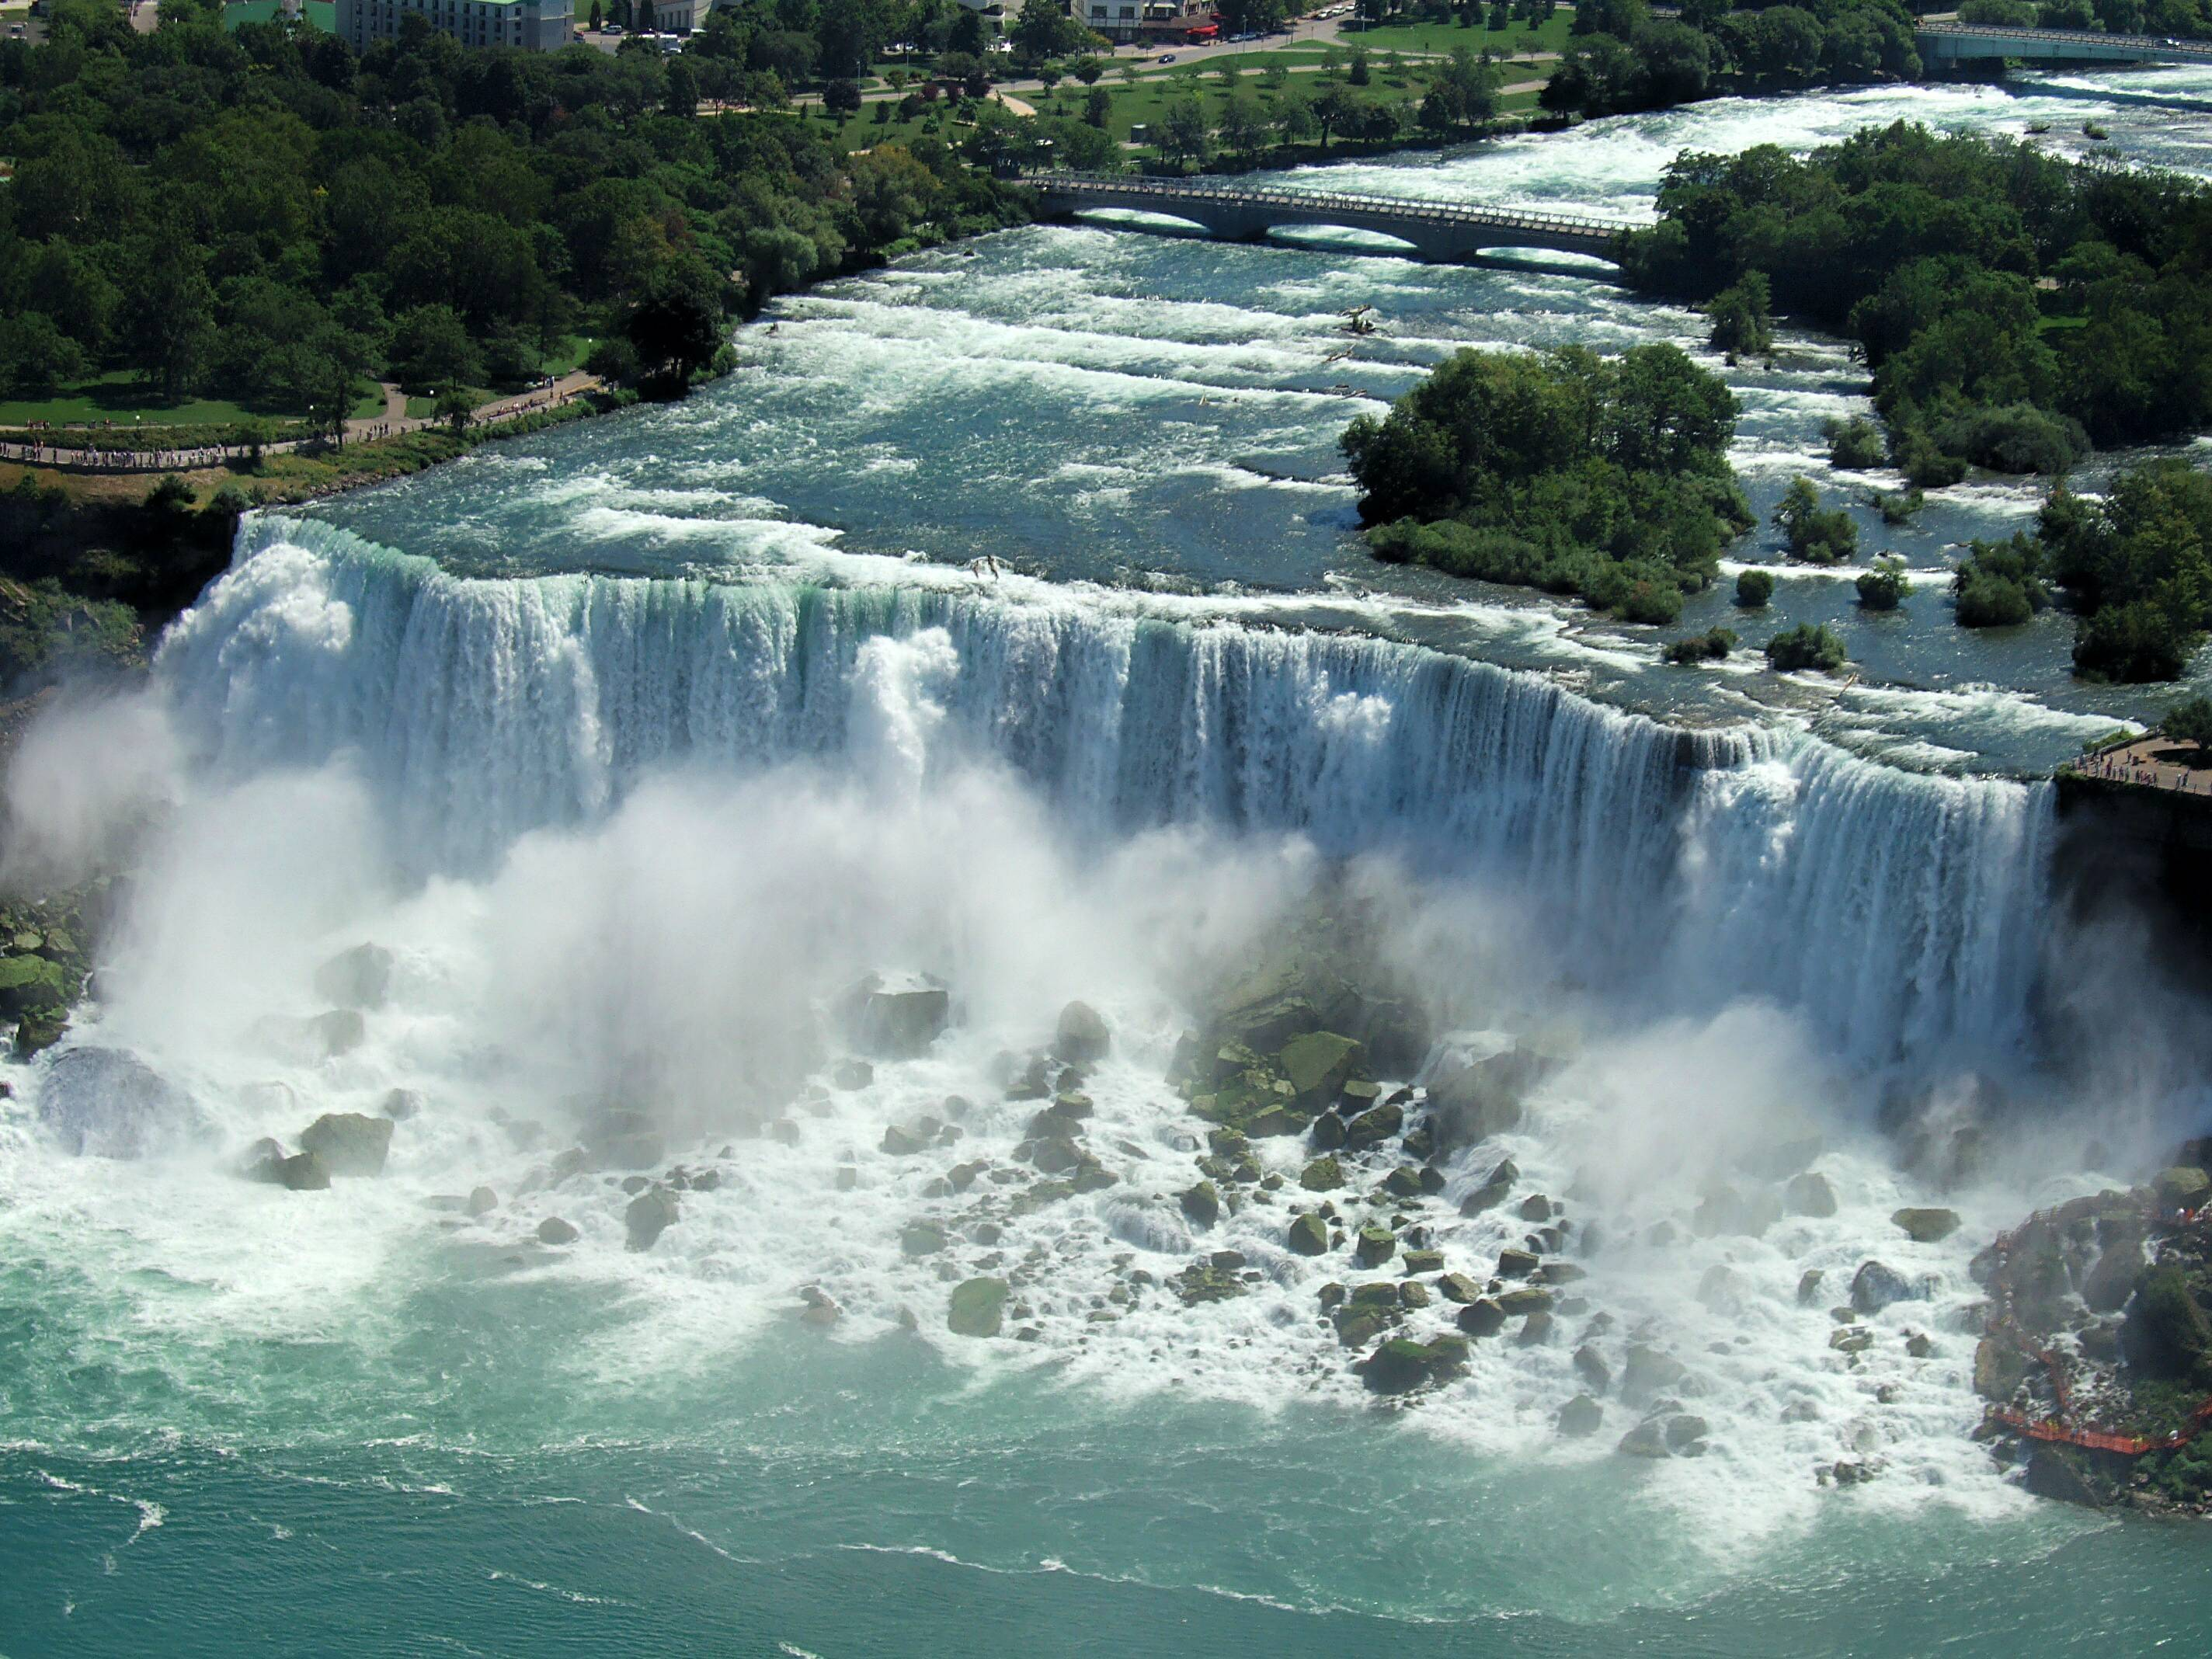 Niagara Falls Full Hd Wallpaper Niagara Falls Wallpapers Wallpaper Cave